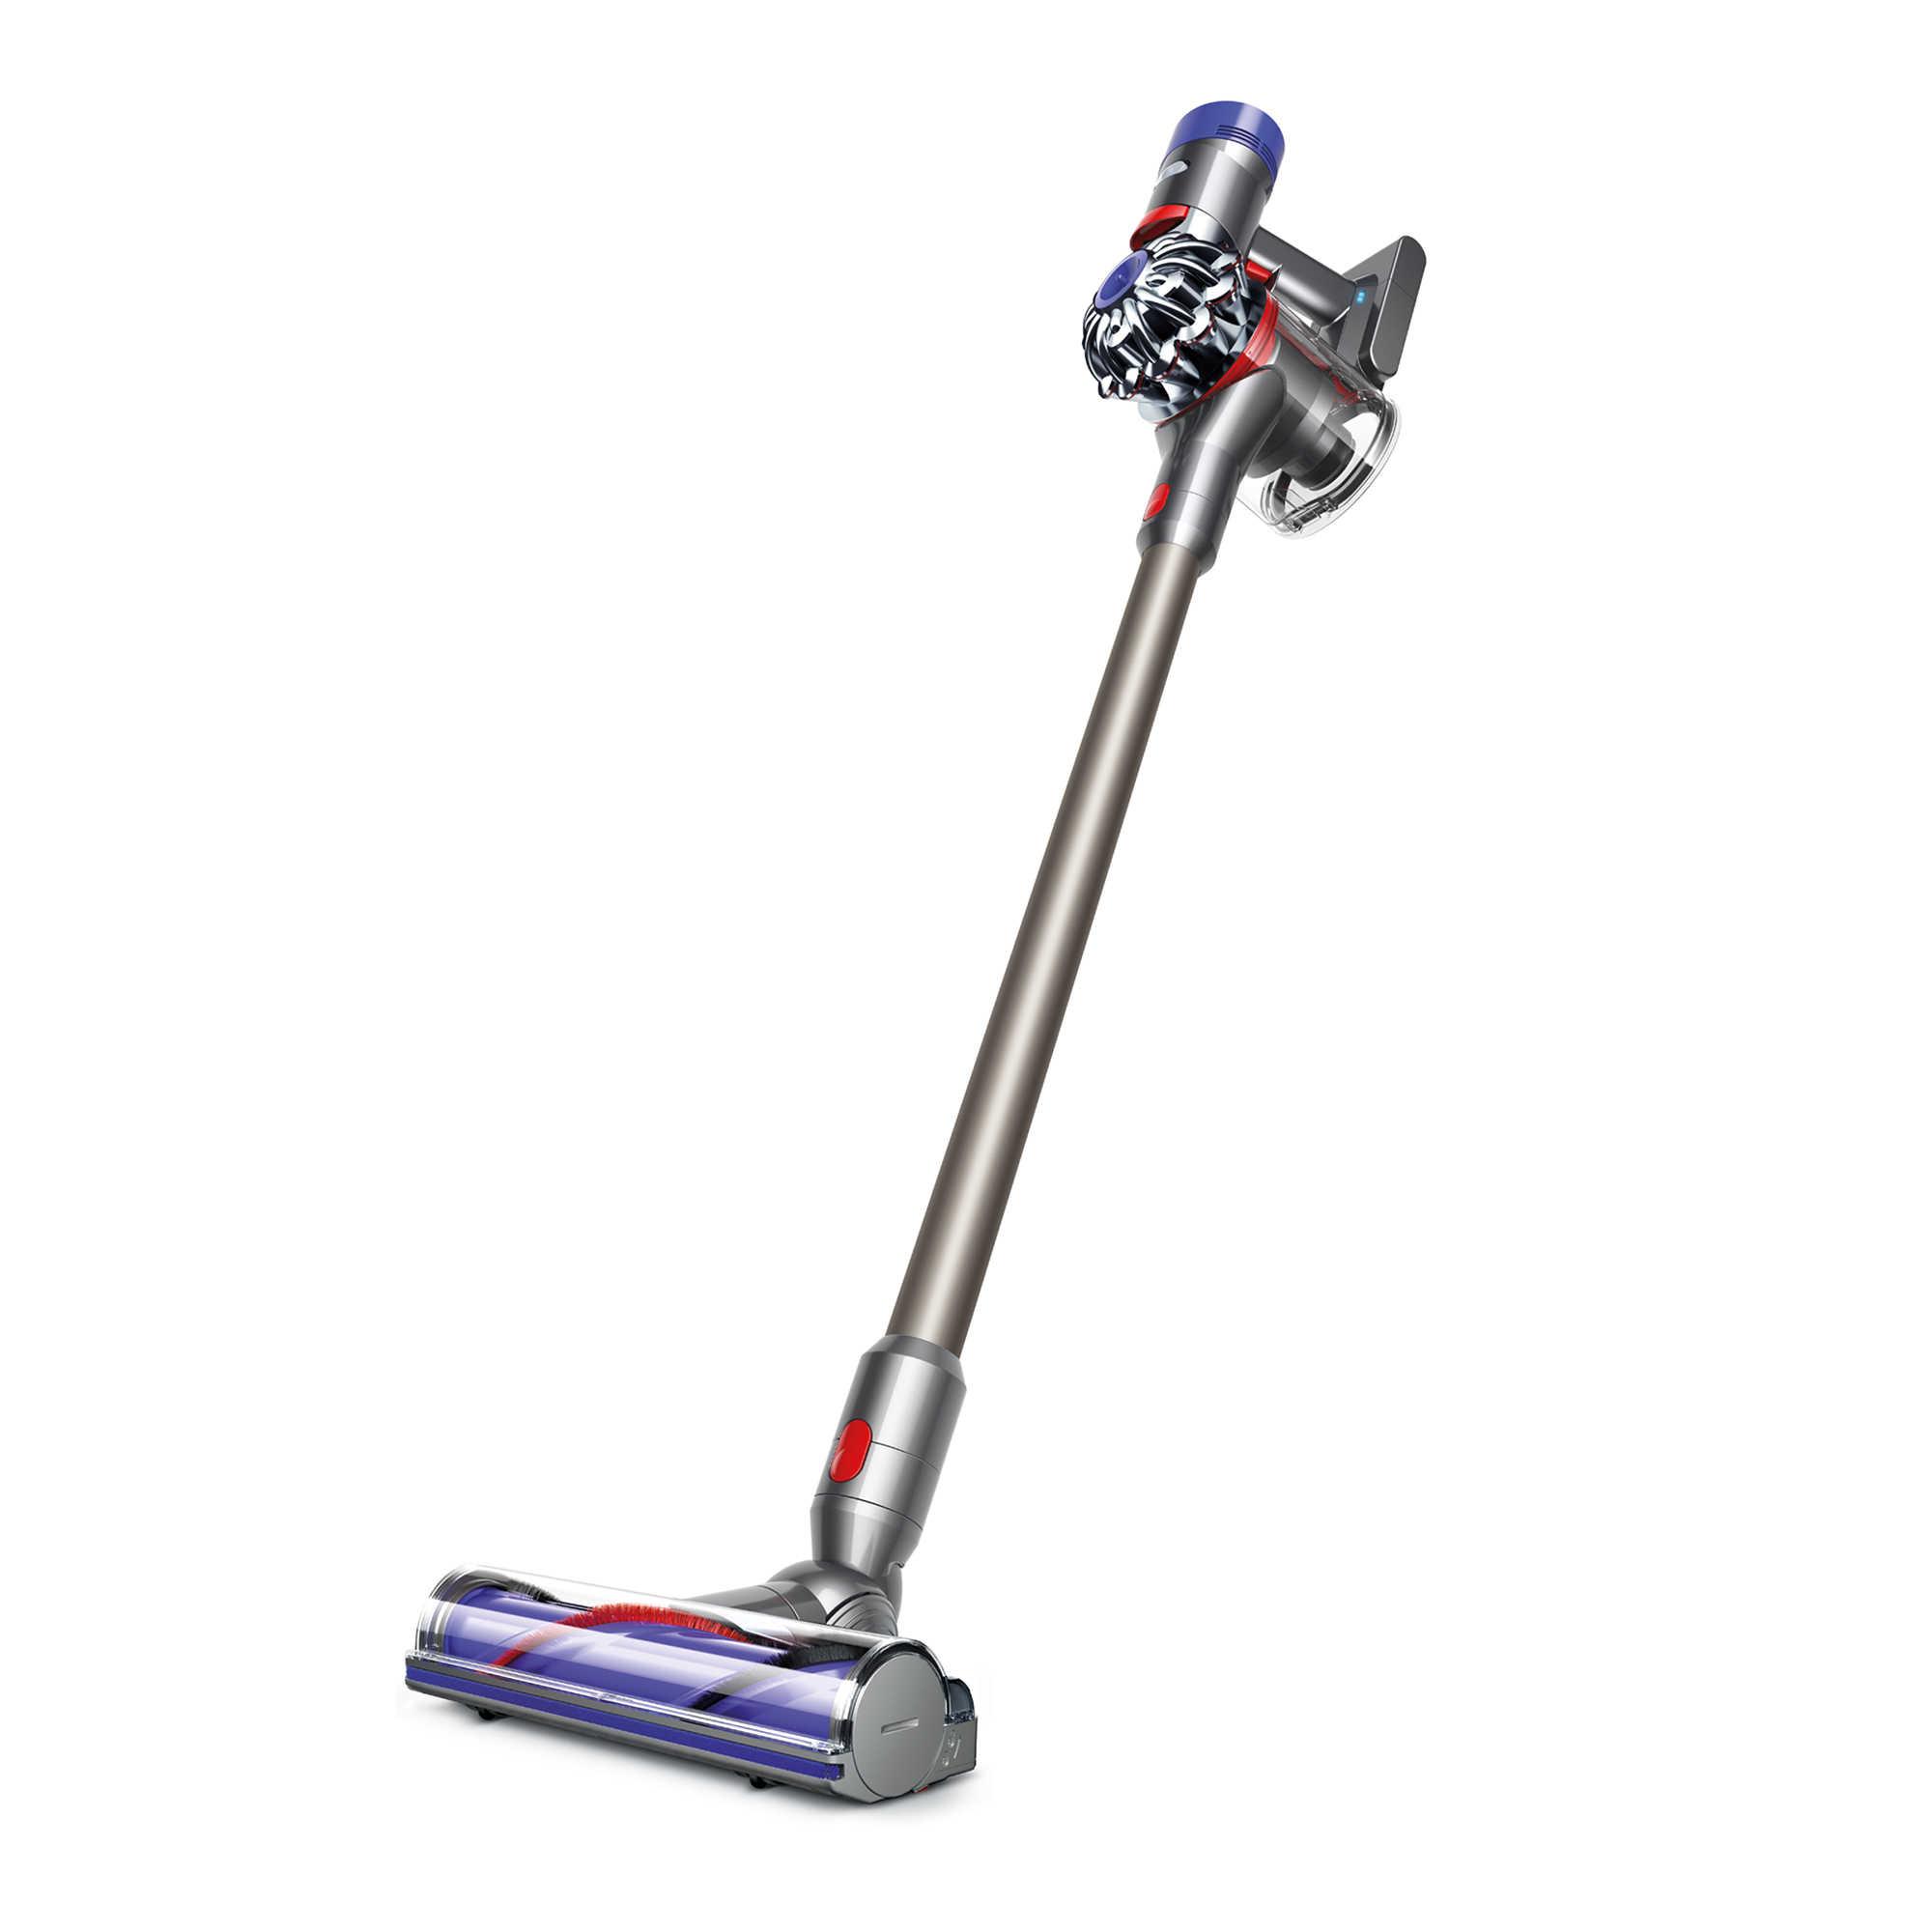 Dyson V8 Animal Cord-free Vacuum in Nickel/Titanium $319 AC/FS @ BB&Beyond